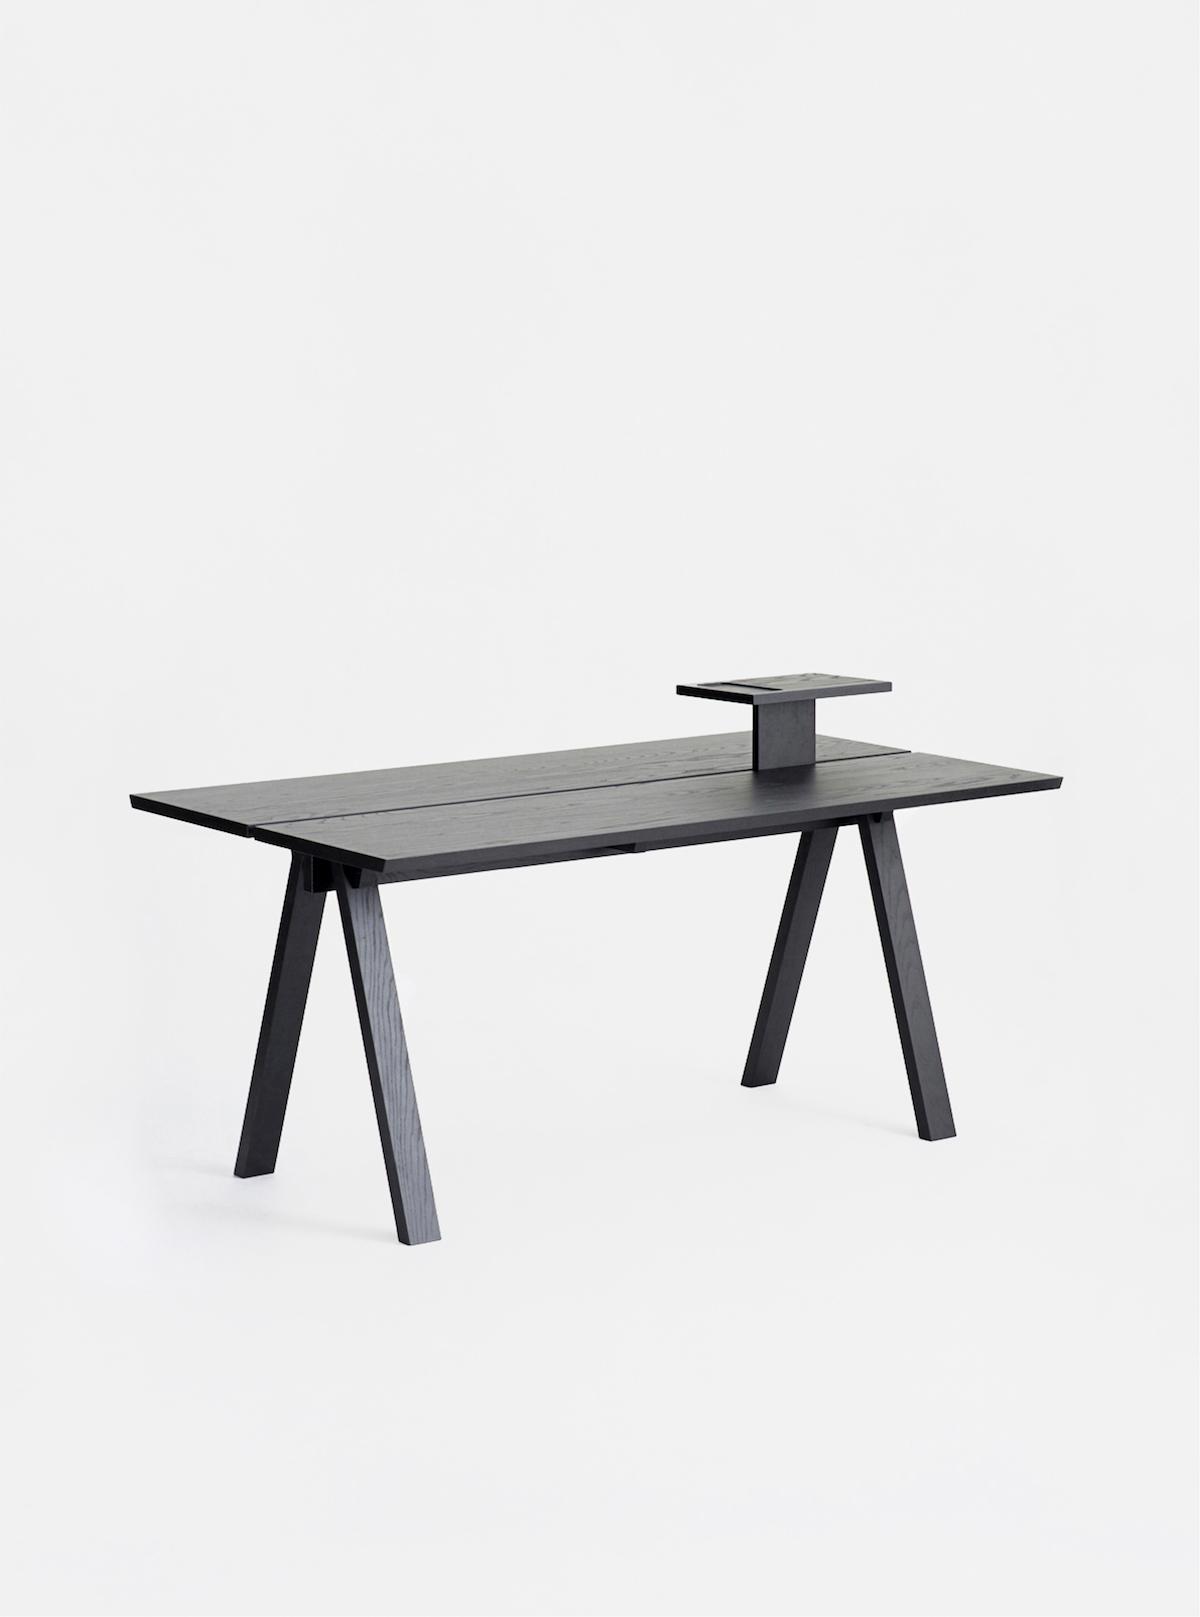 Ariake Collection by Legnatec and Hirata Chair